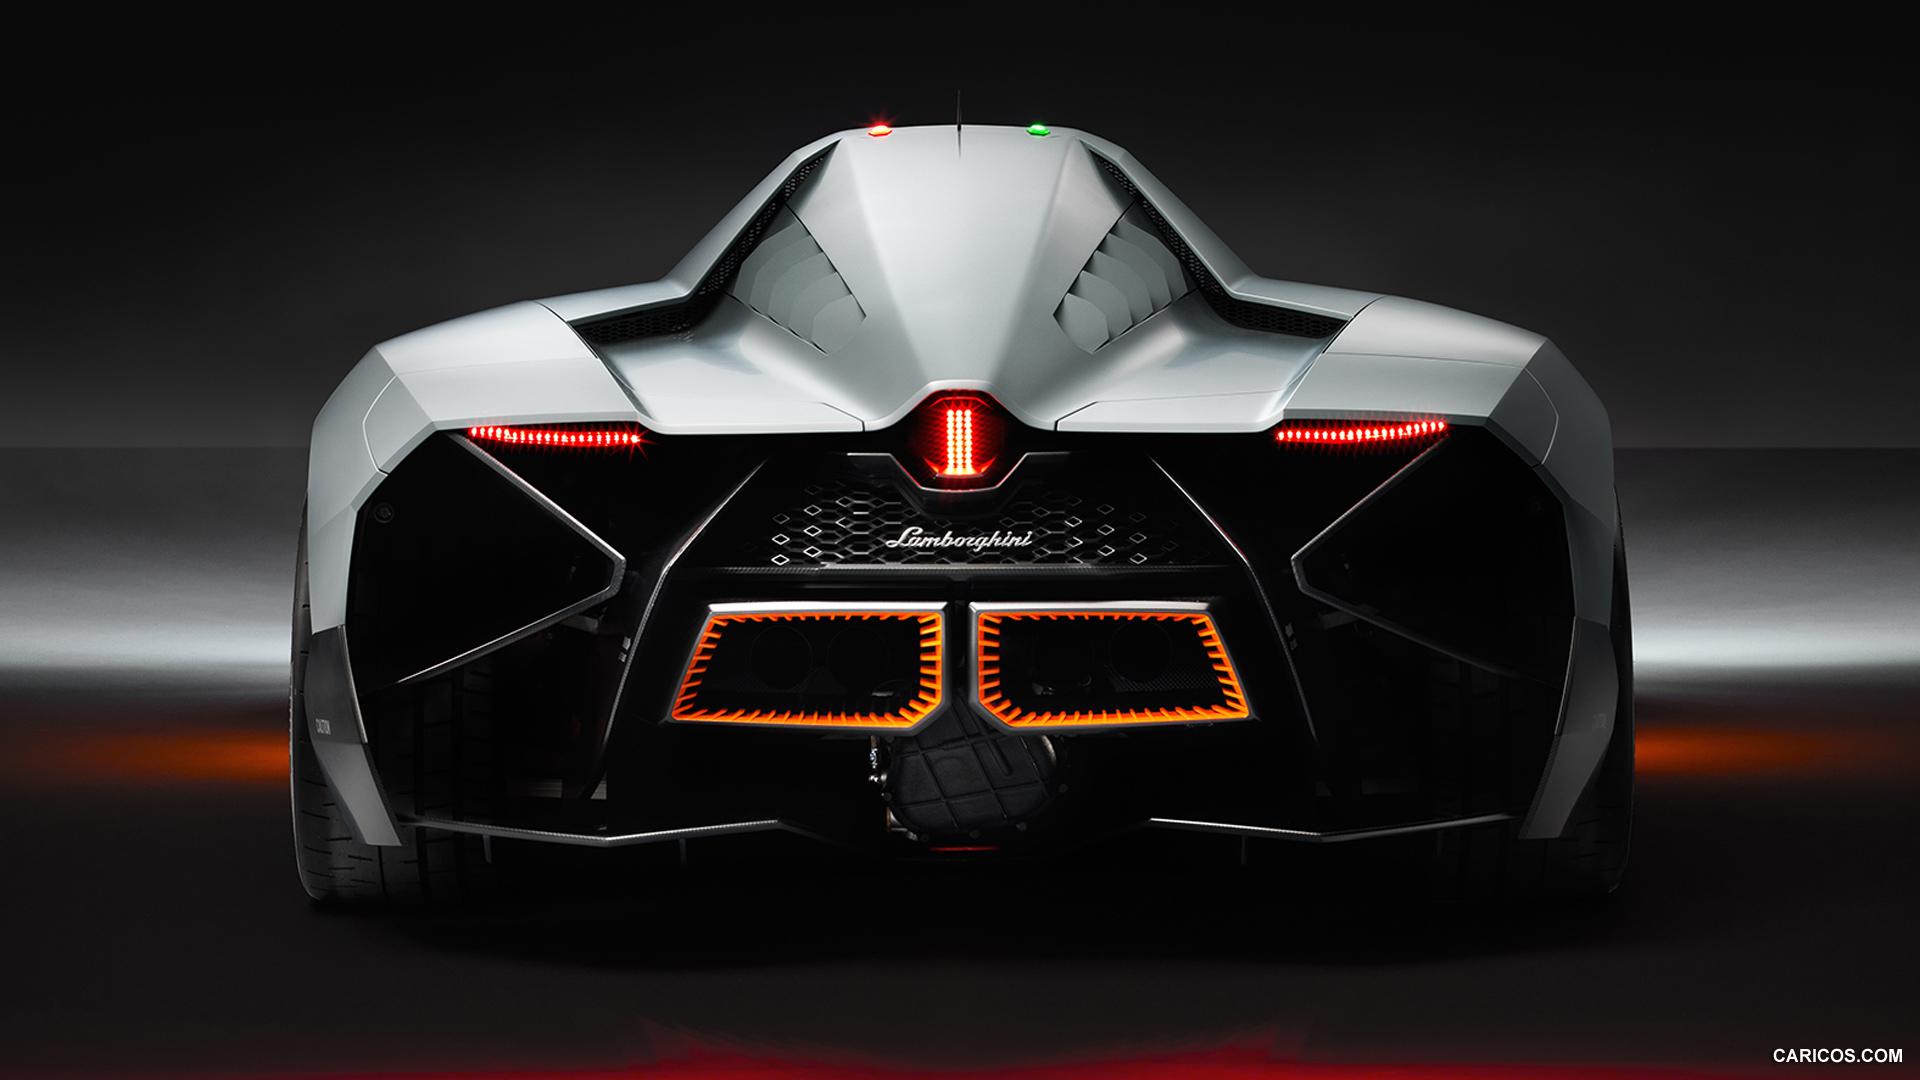 Wallpaper Desktop 3d Animation Lamborghini Veneno Wallpaper Downloadwallpaper Org